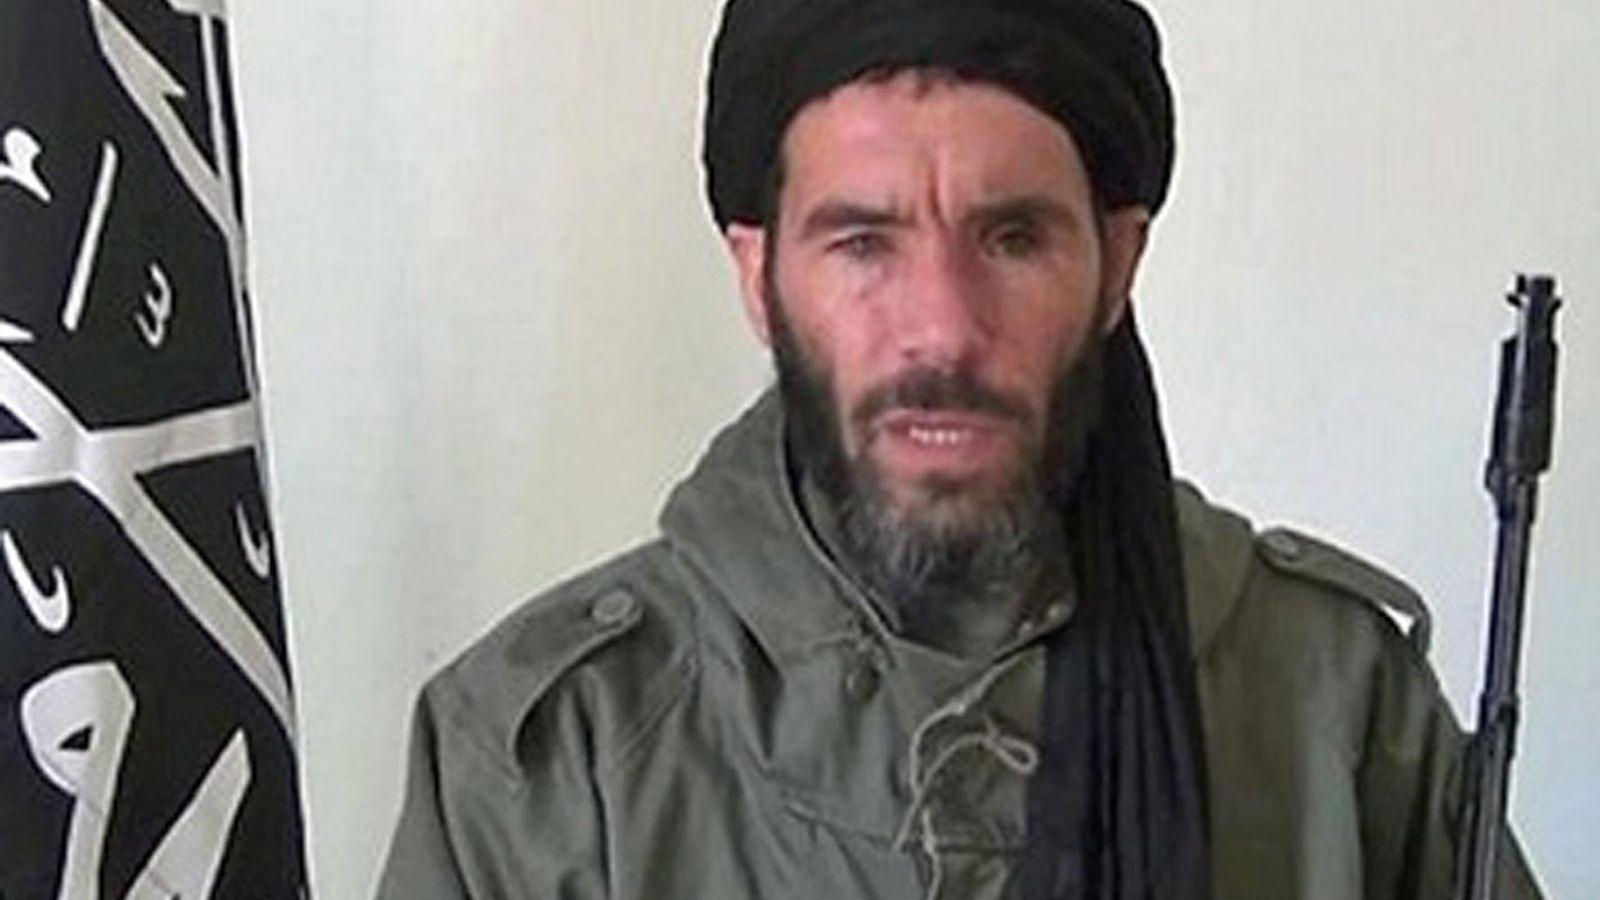 Foto: Foto sin fecha del yihadista Mokhtar Belmokhtar, difundida por el FBI. (Efe)